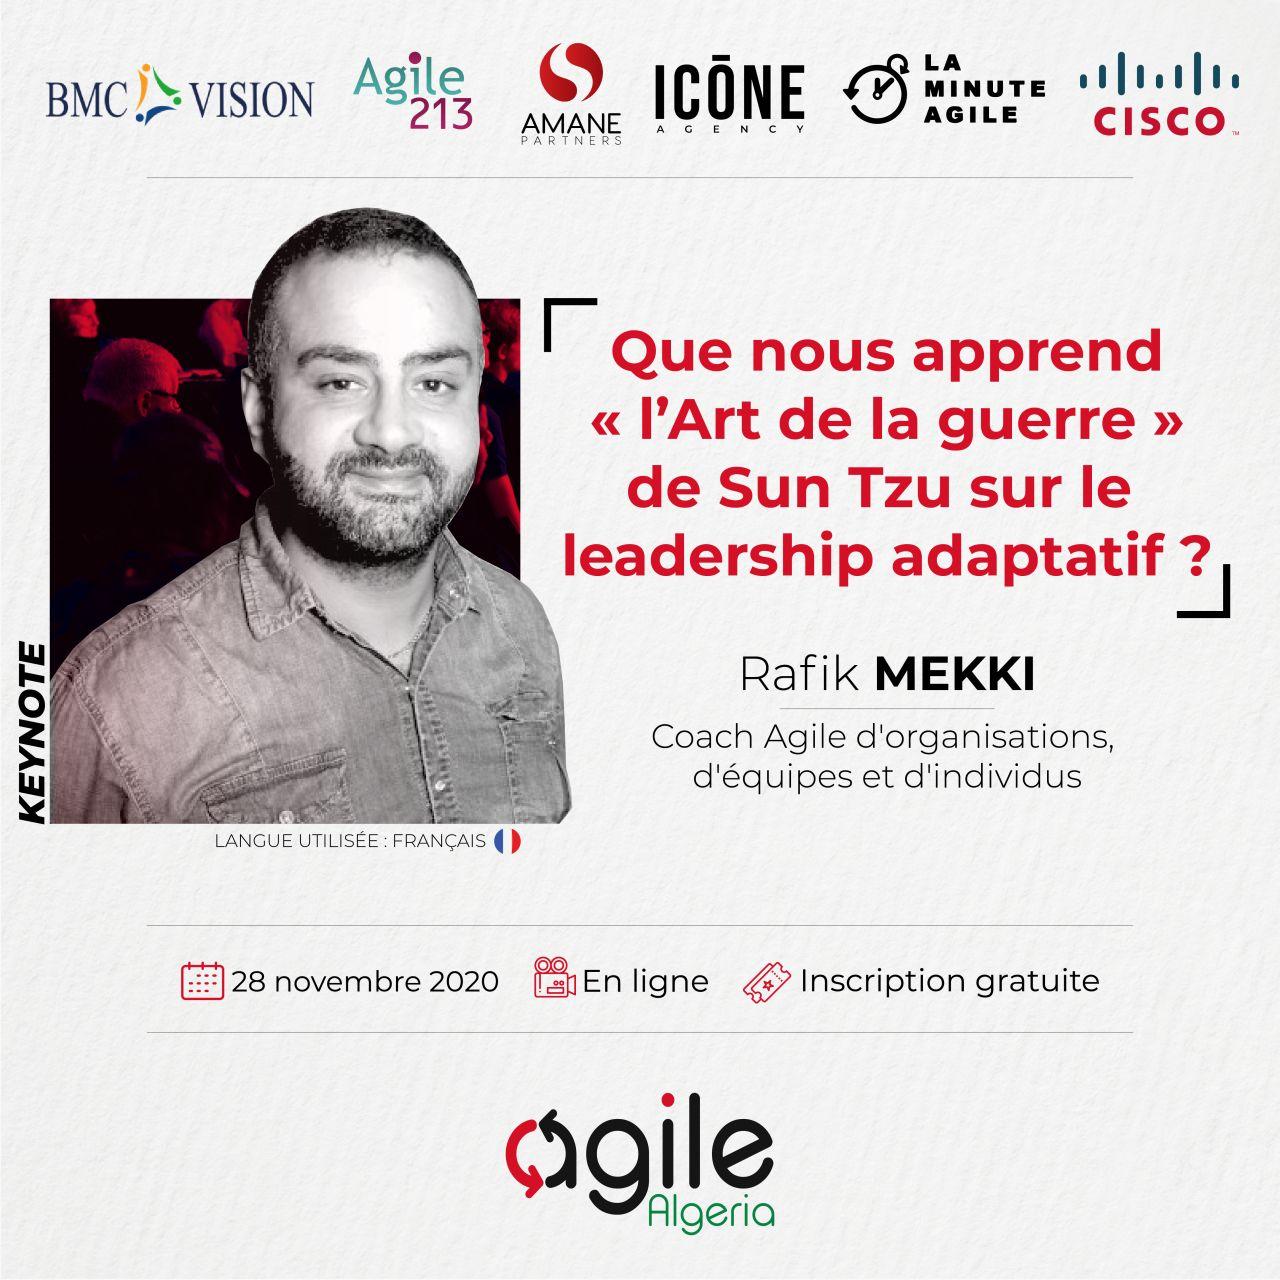 Agile algeria on LinkedIn